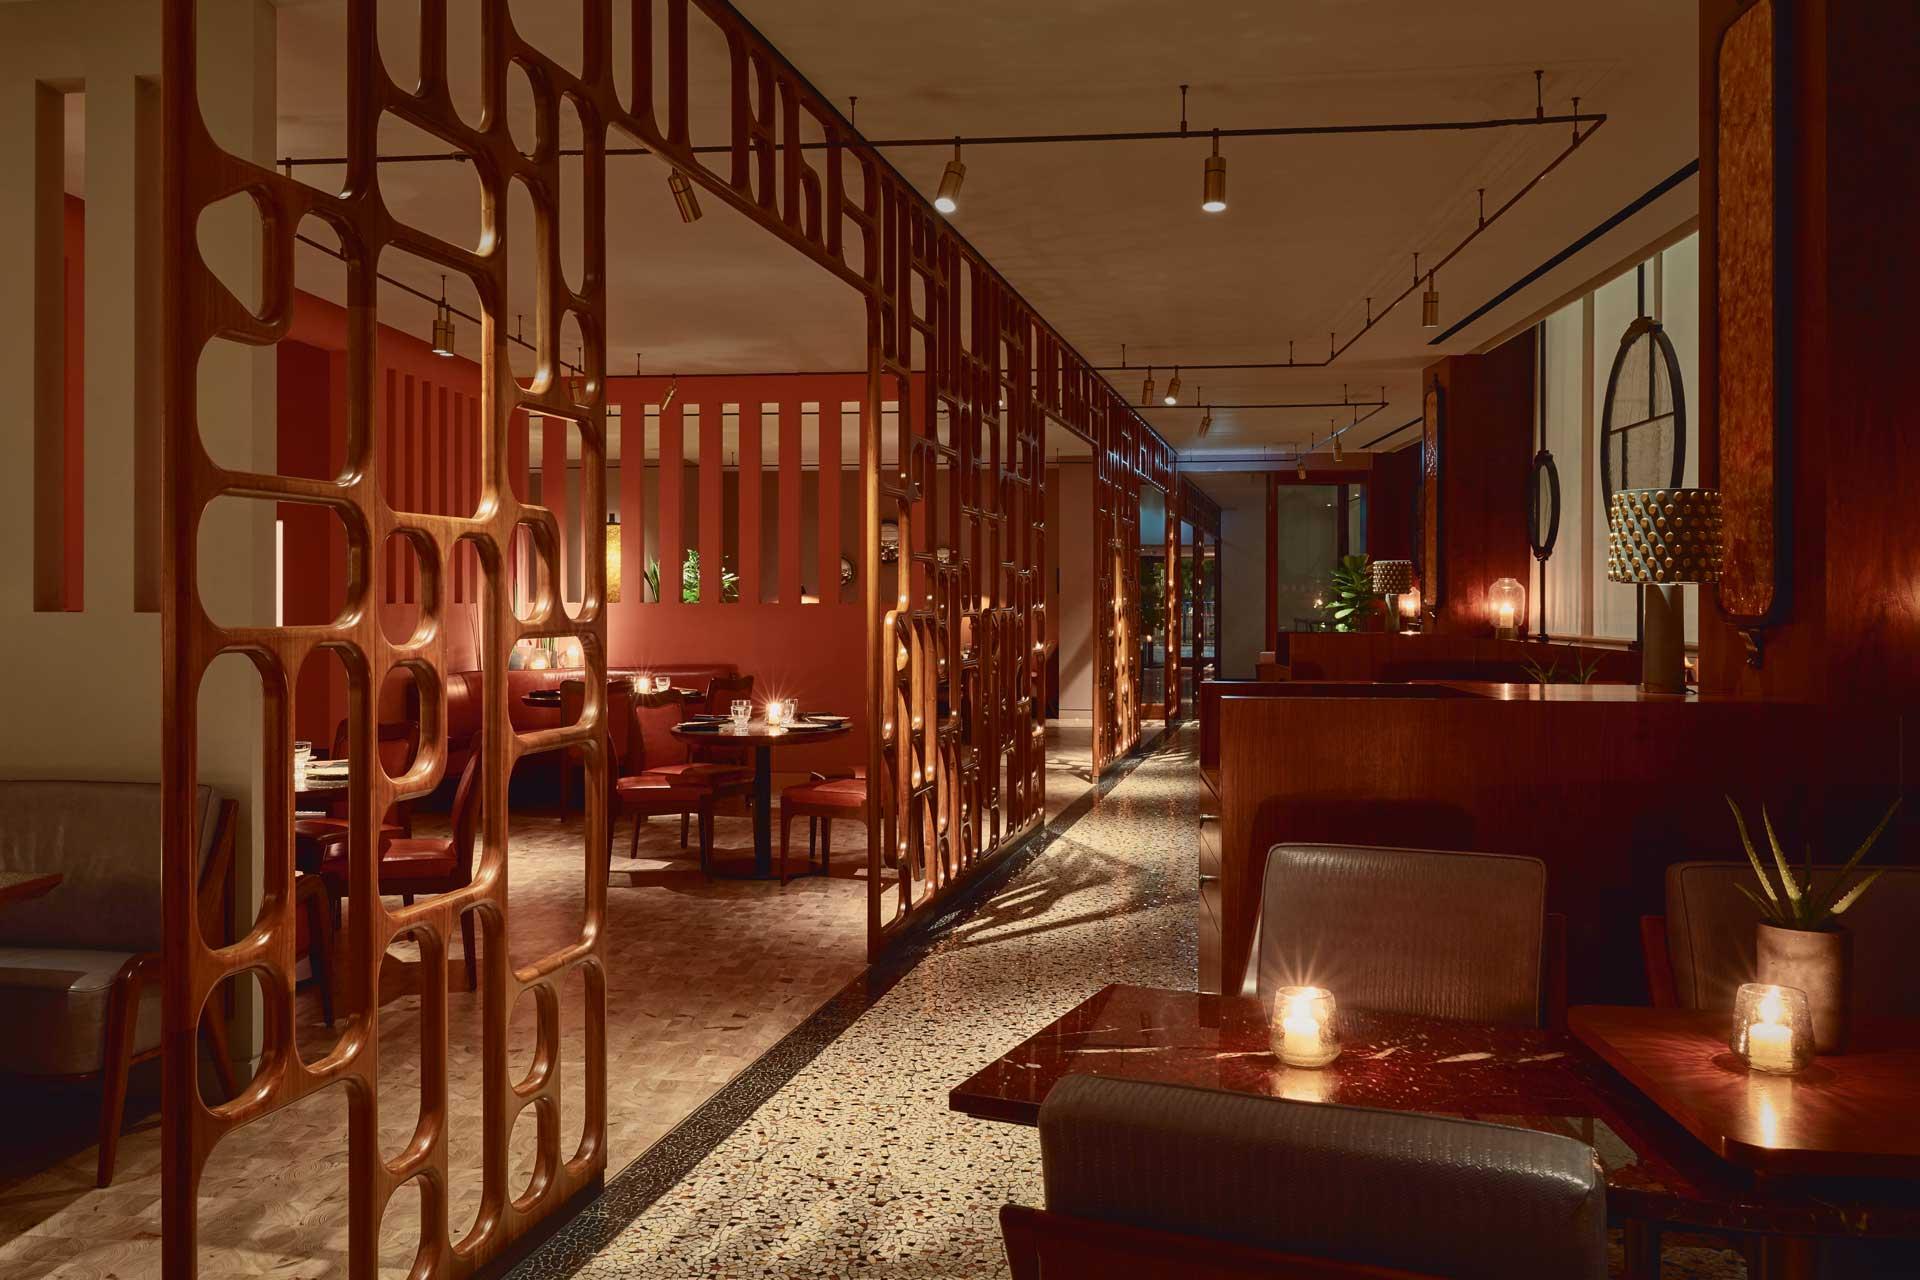 Interiors of Mexican fine-dining restaurant Ella Canta